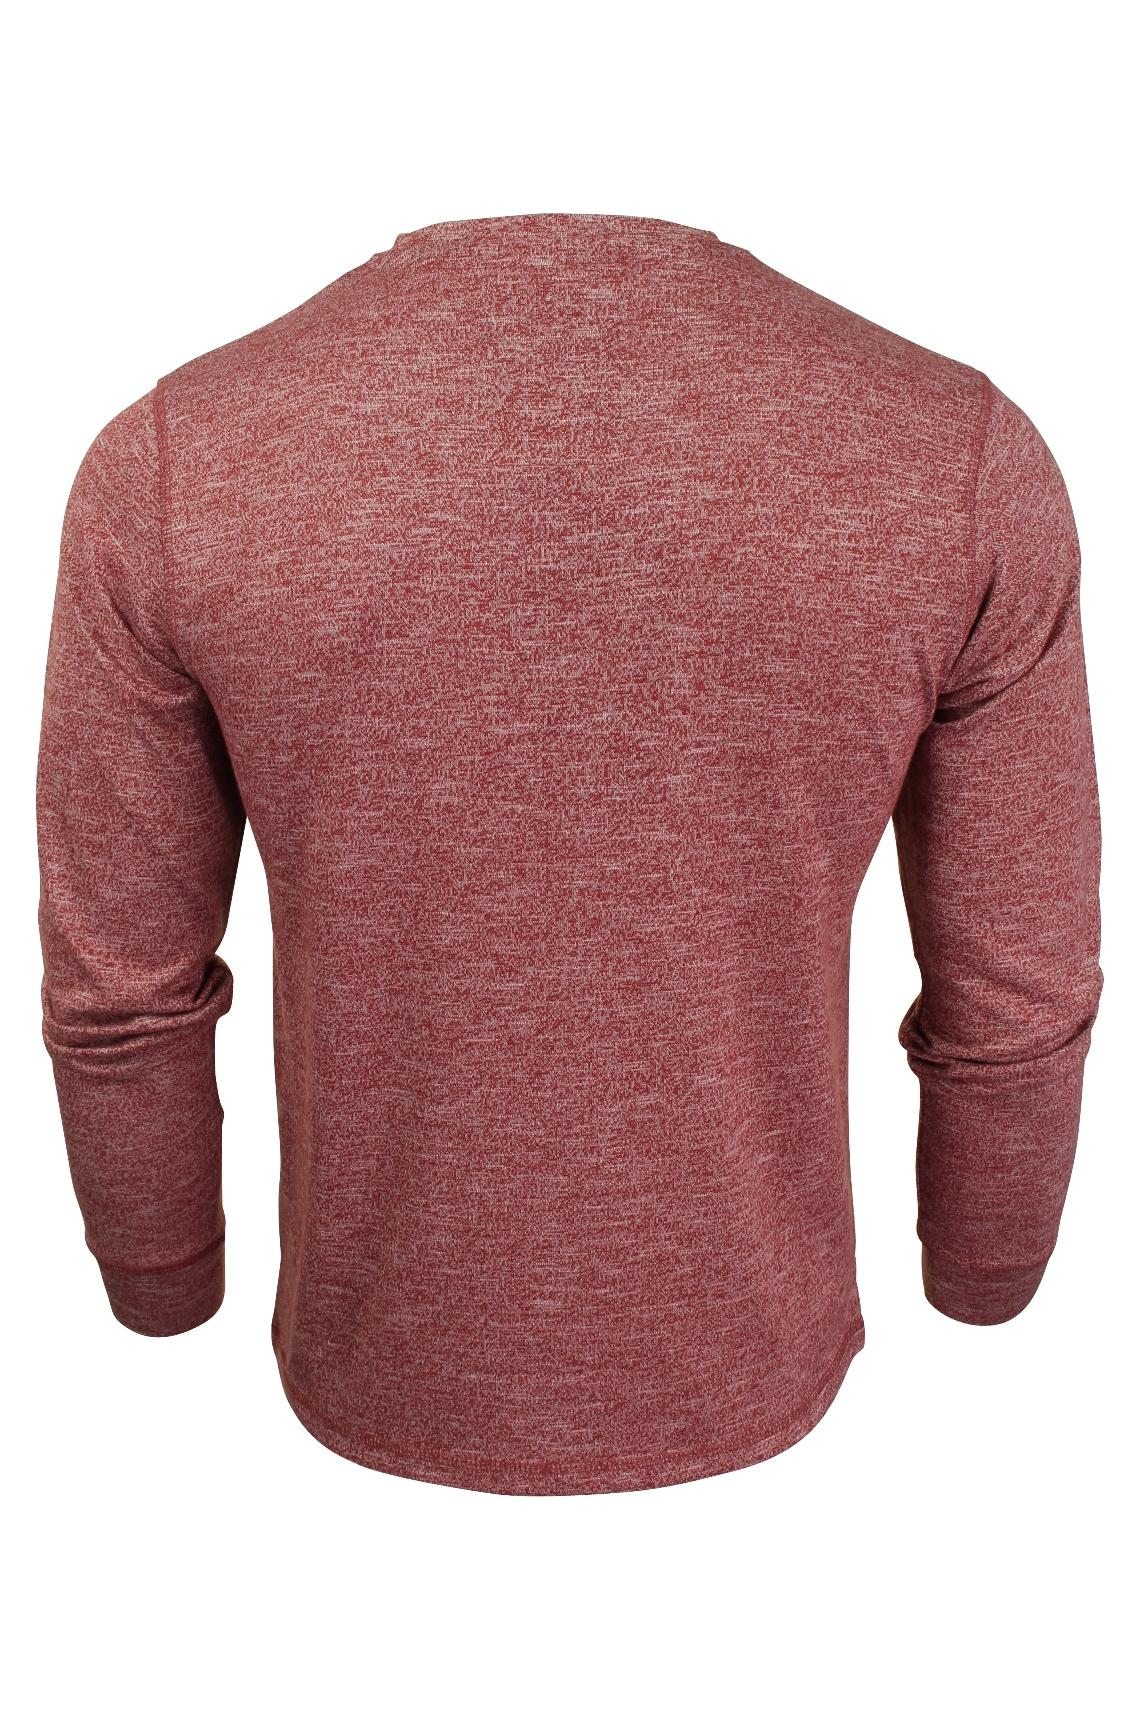 Mens-Top-shirt-by-Tokyo-Laundry-039-Dawsons-Ridge-039-Long-Sleeved thumbnail 8